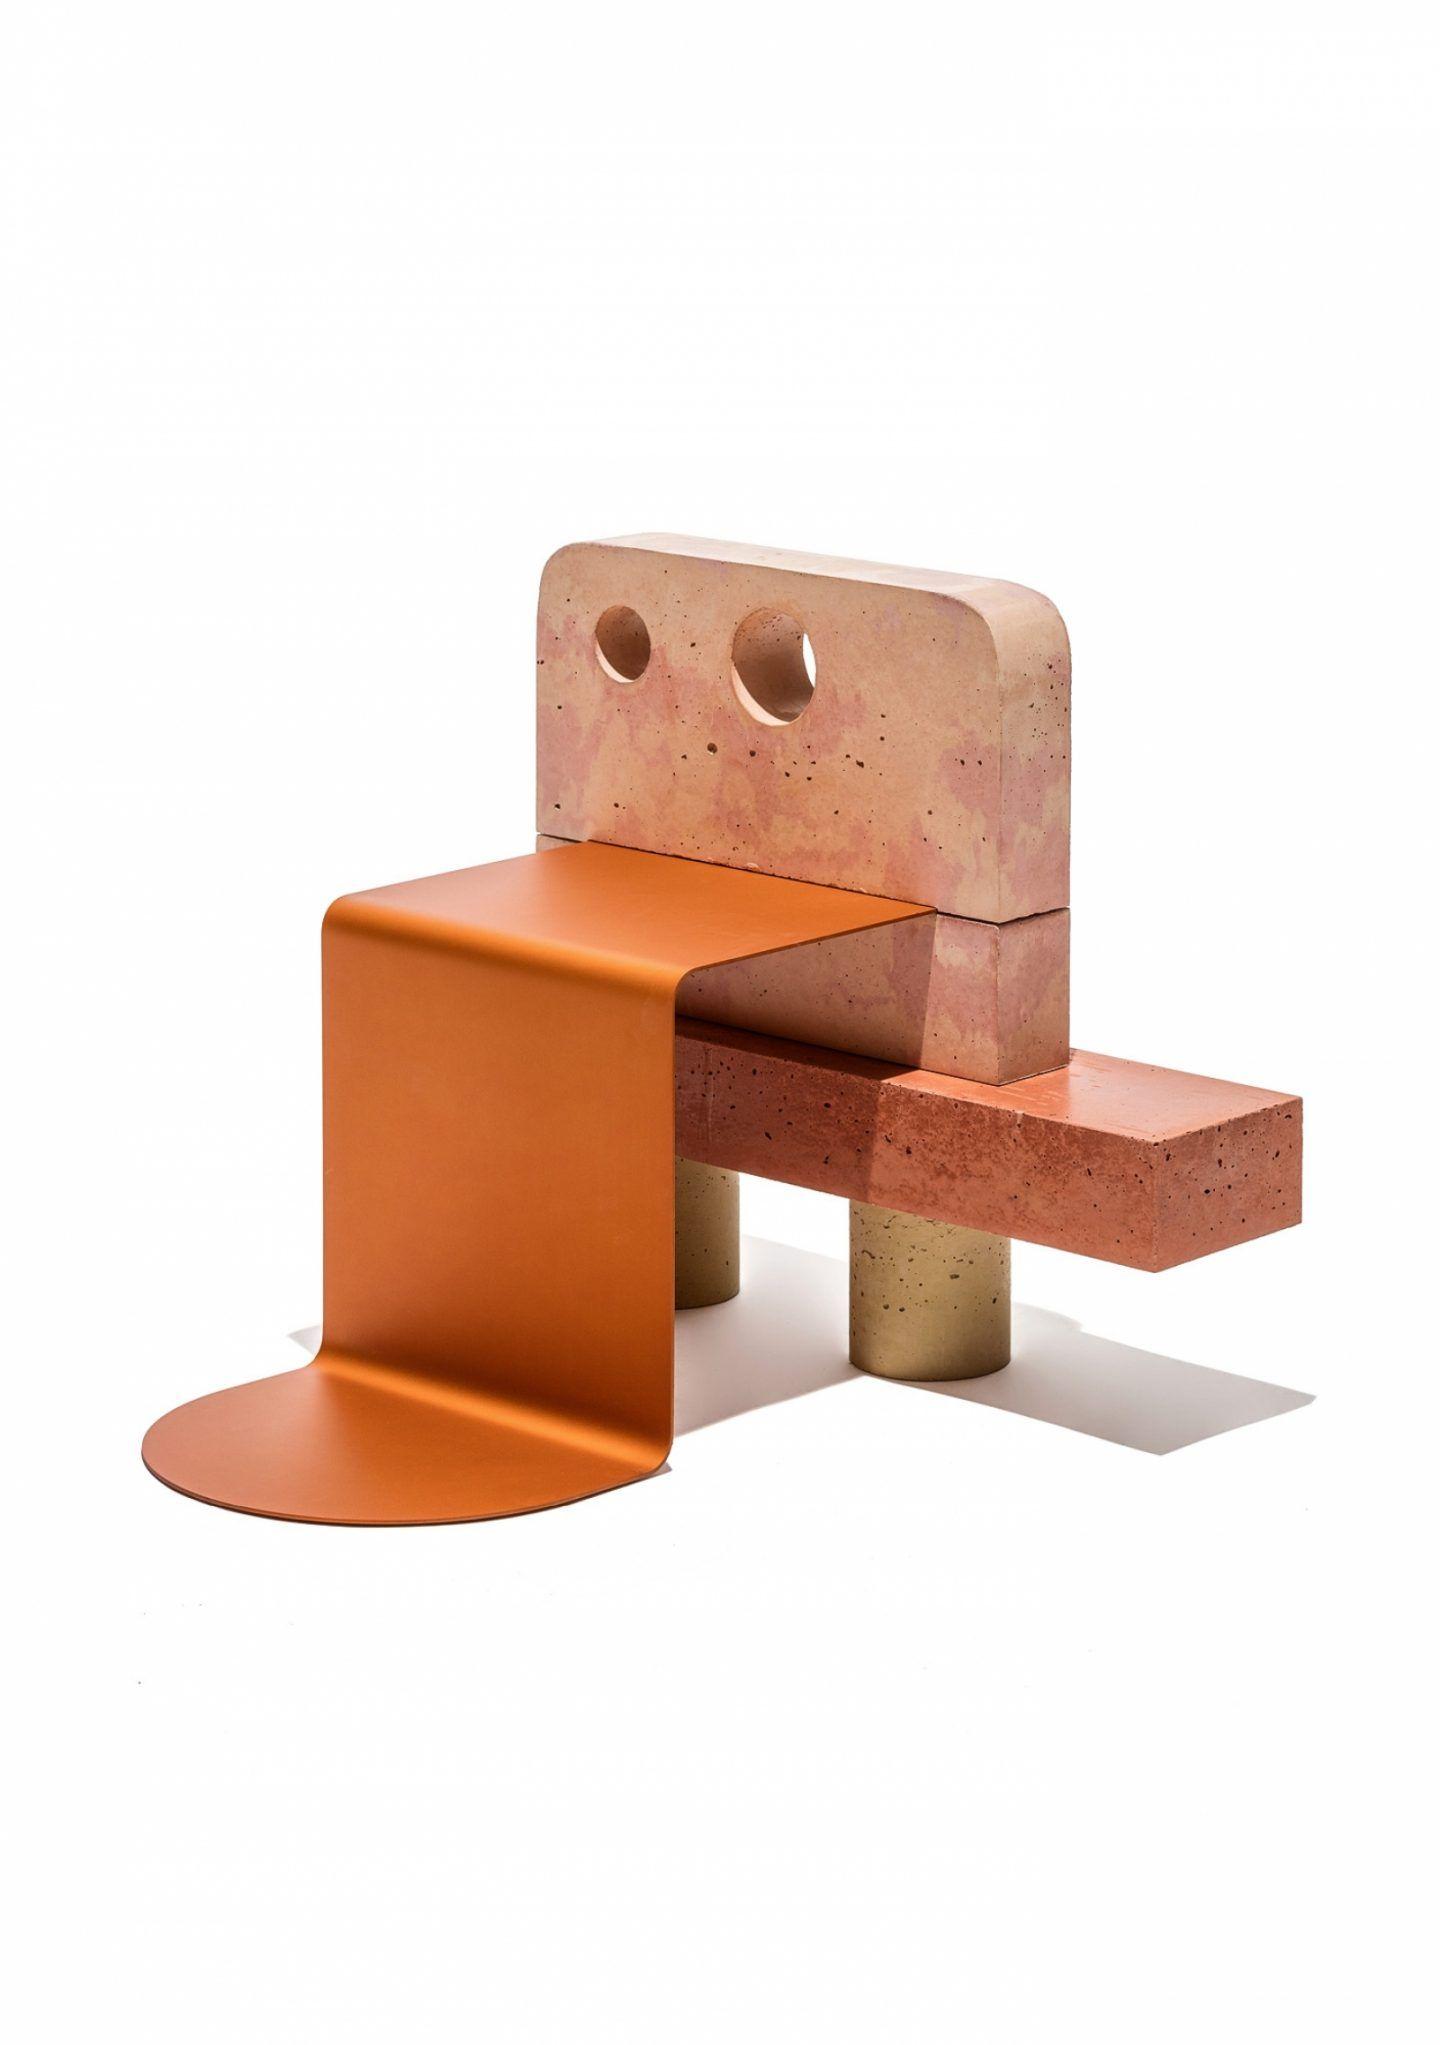 IGNANT-Design-Pettersen-Hein-011